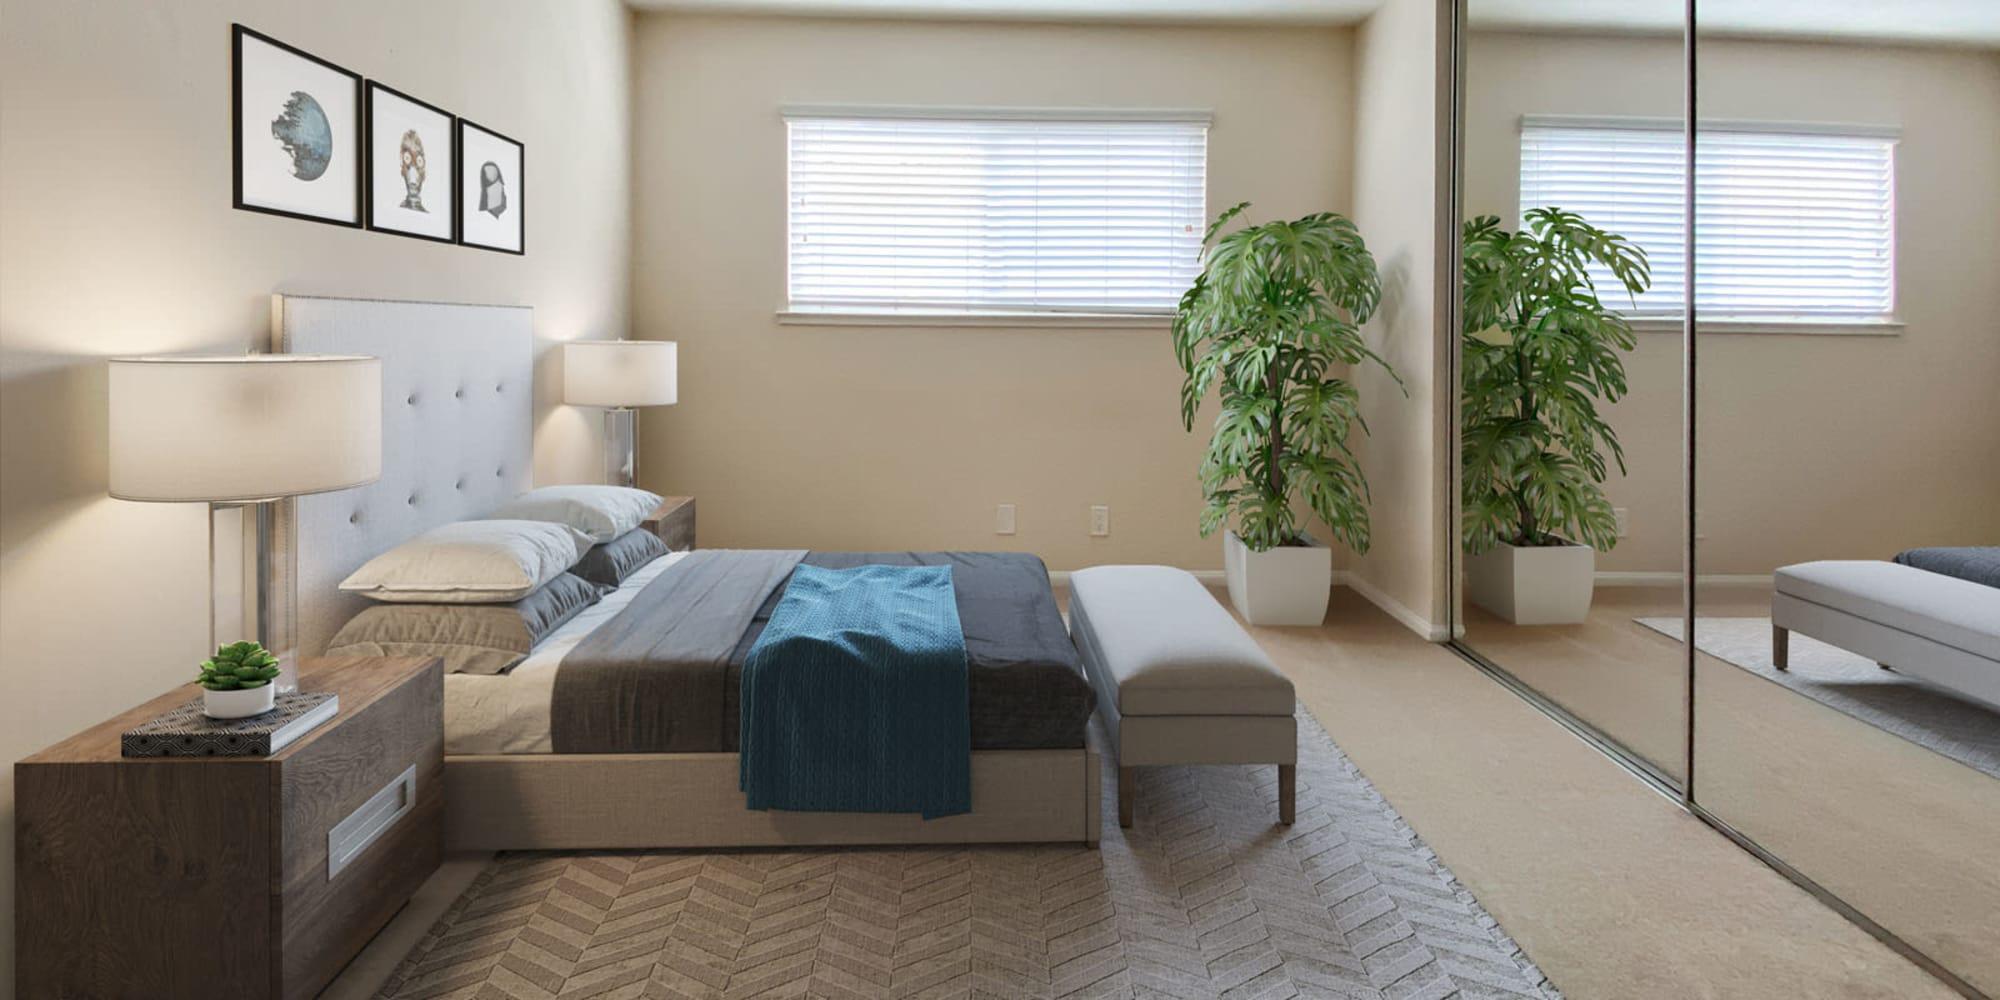 Mirrored closet doors in a model apartment's primary bedroom at Pleasanton Place Apartment Homes in Pleasanton, California